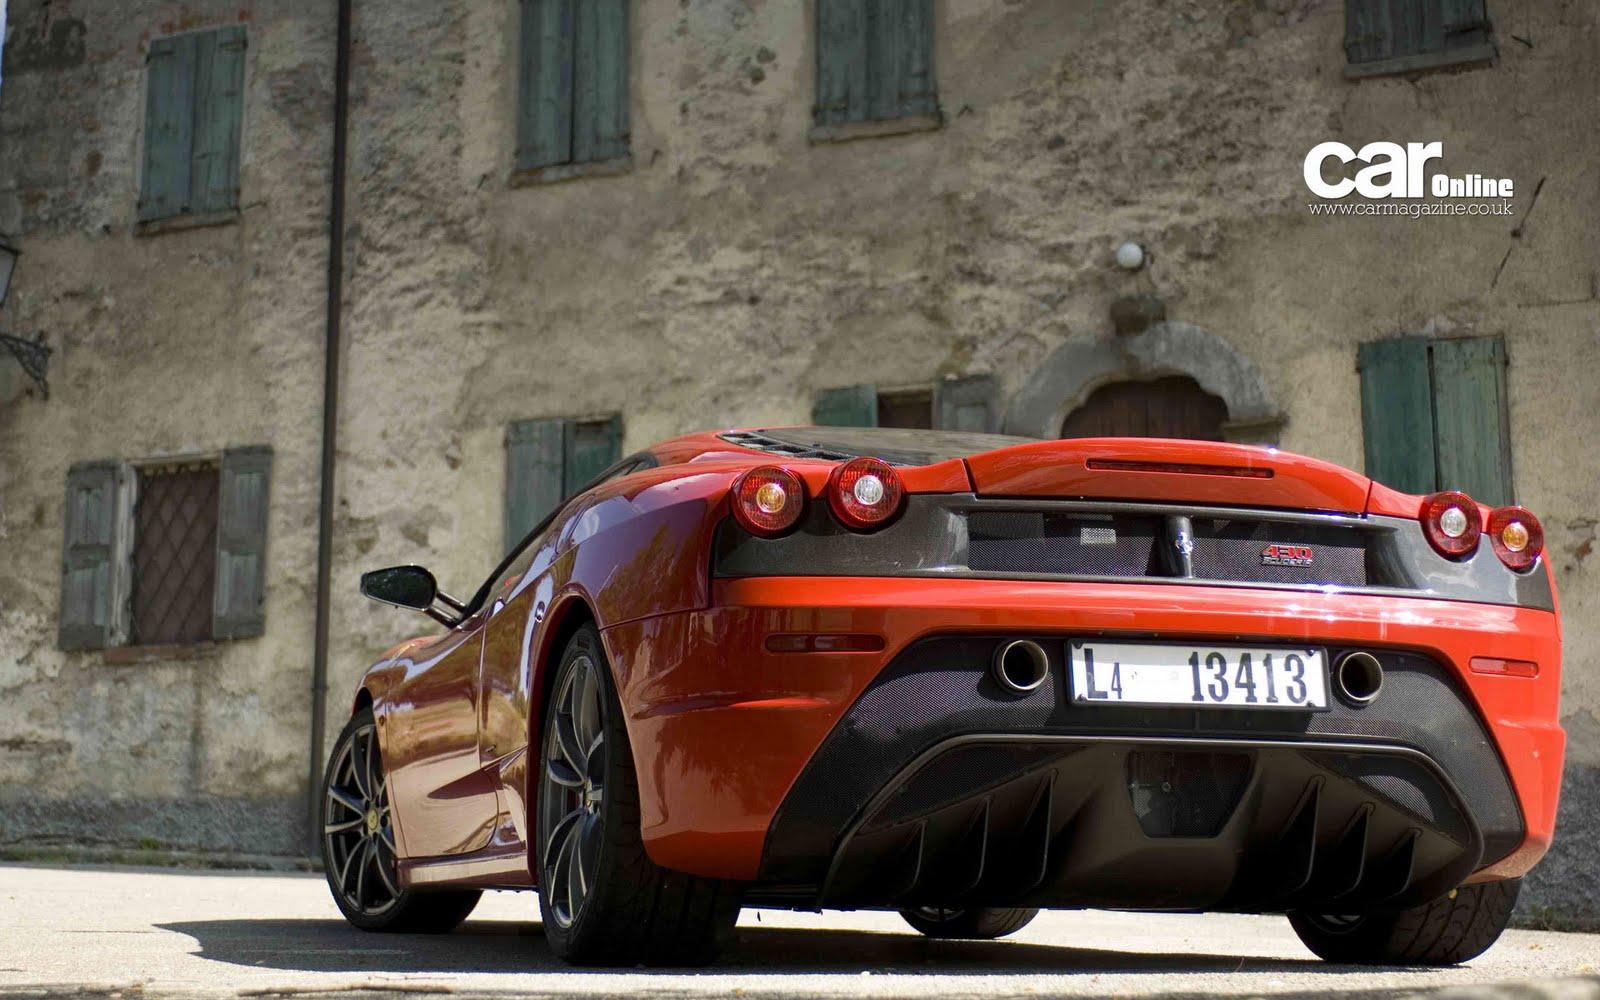 Ferrari F430 Scuderia Wallpaper Cars Wallpapers And